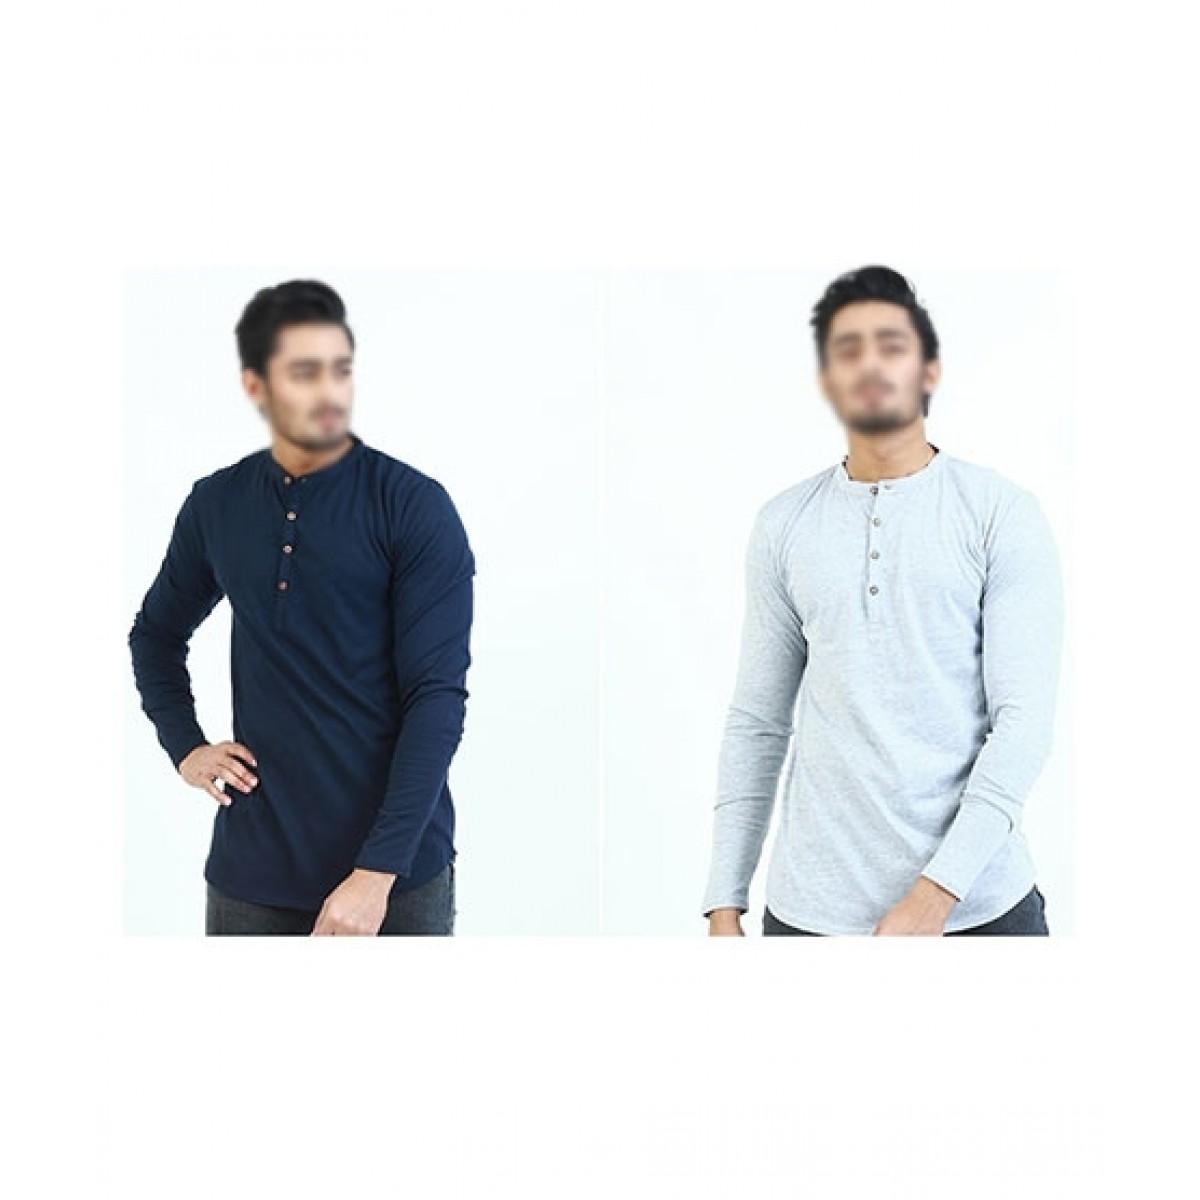 The Smart Shop Full Sleeves T-Shirt For Men Pack Of 2 (0853)